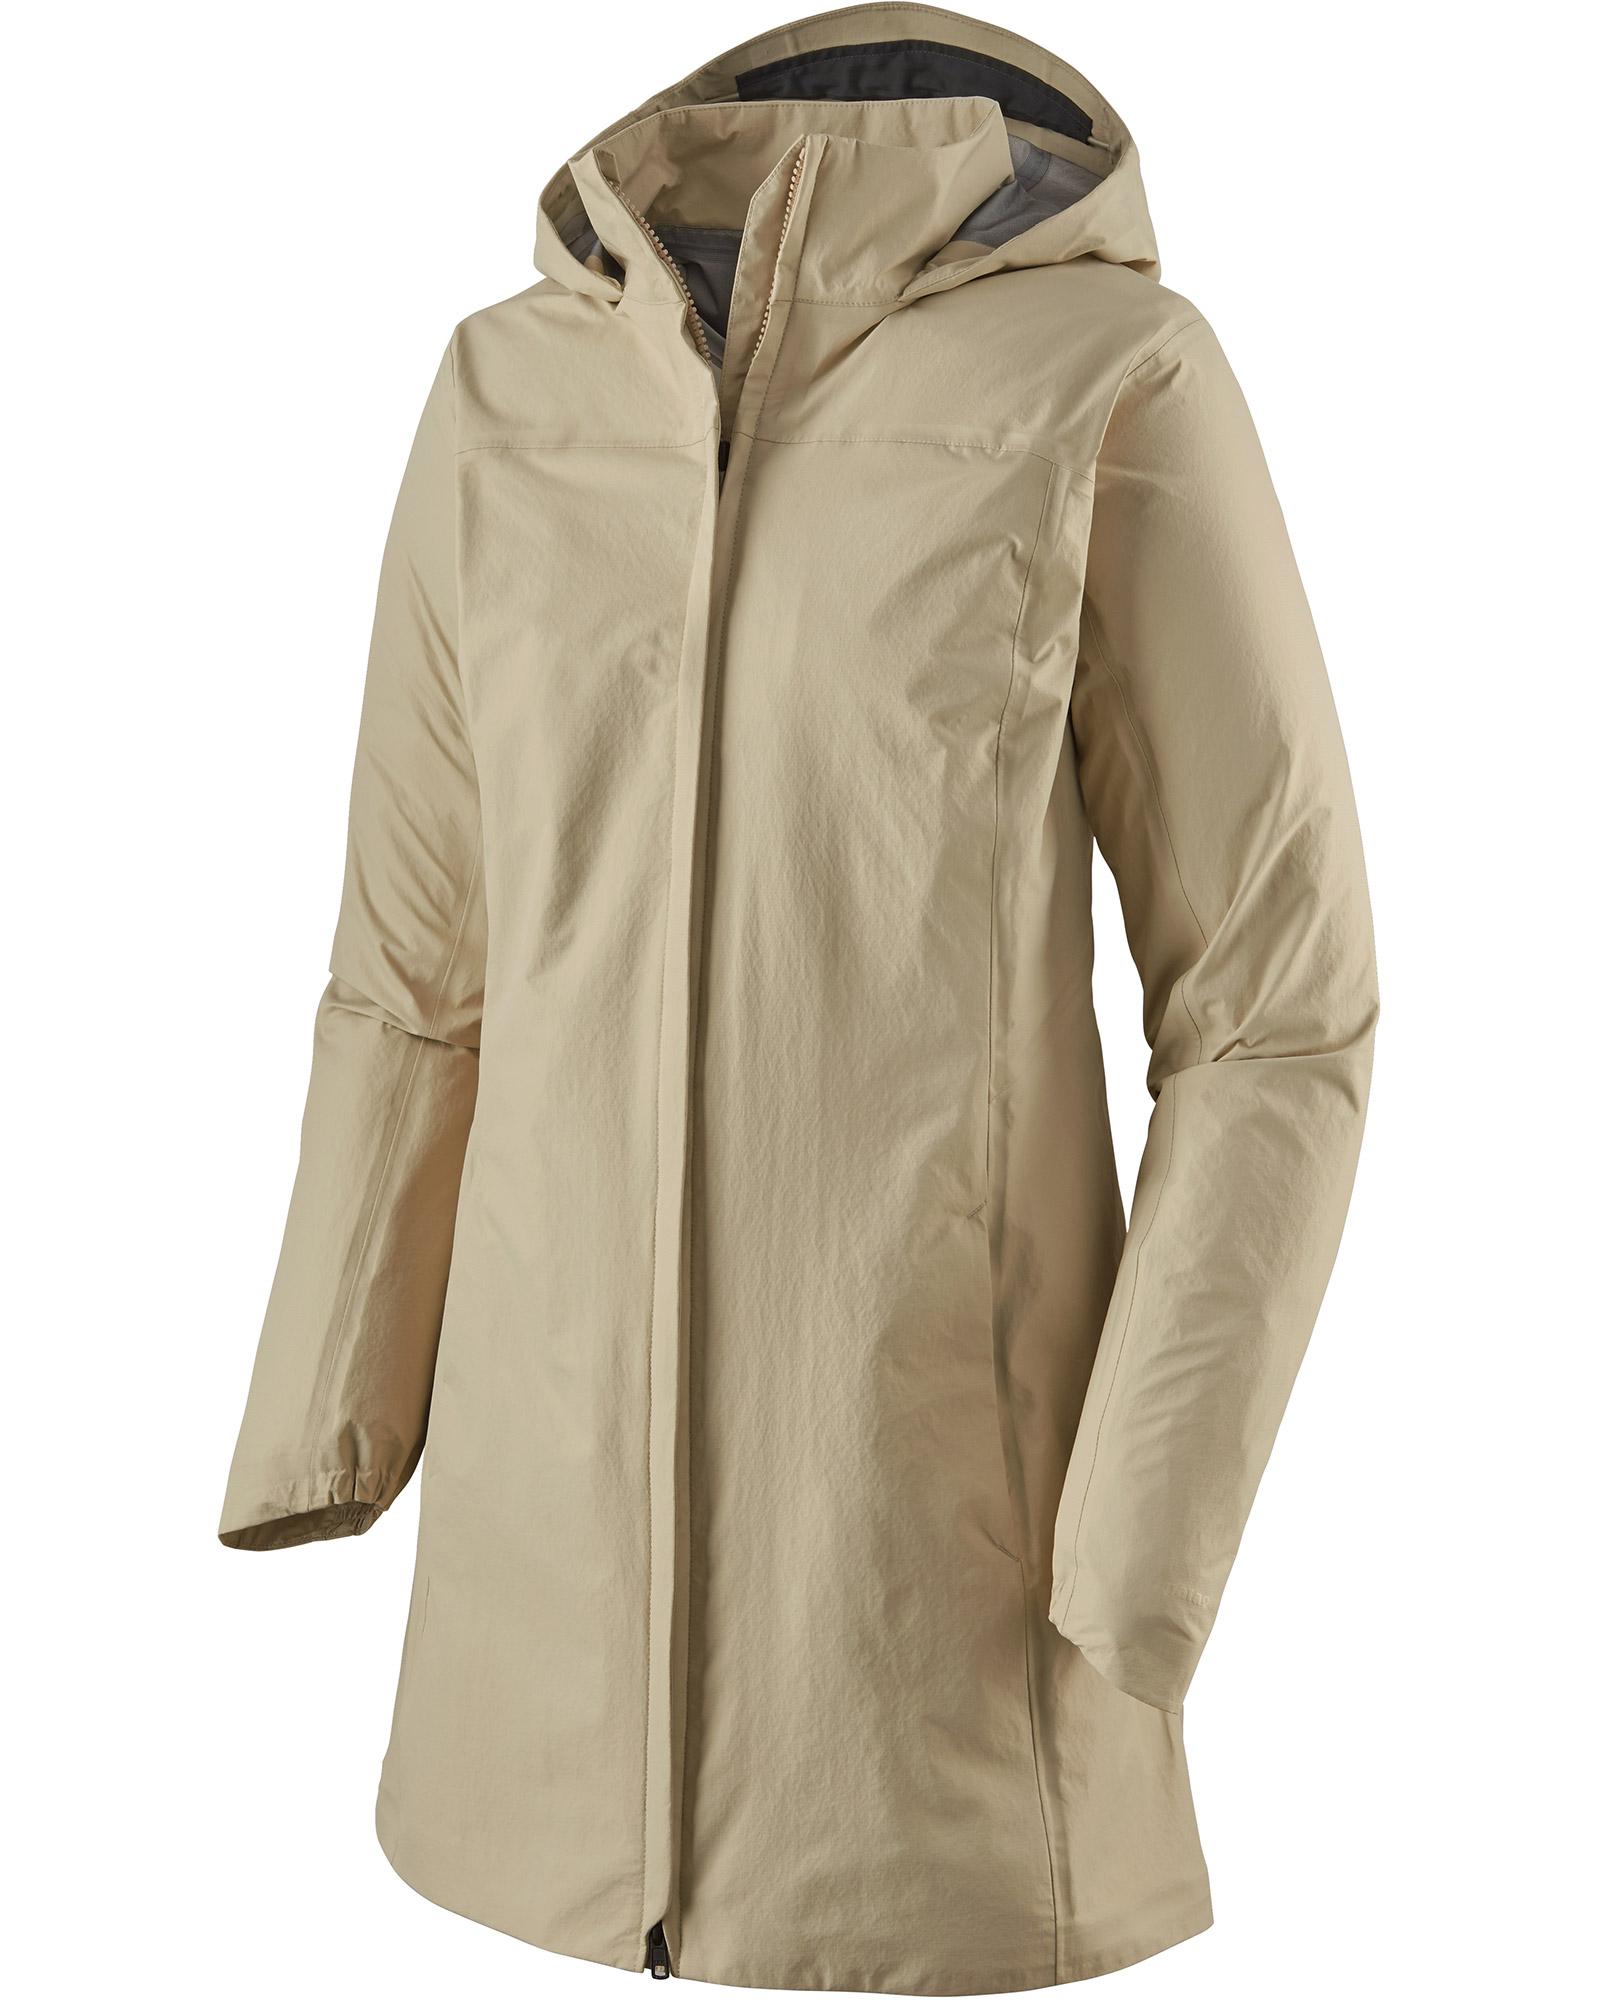 Patagonia Women's Torrentshell City Coat 0